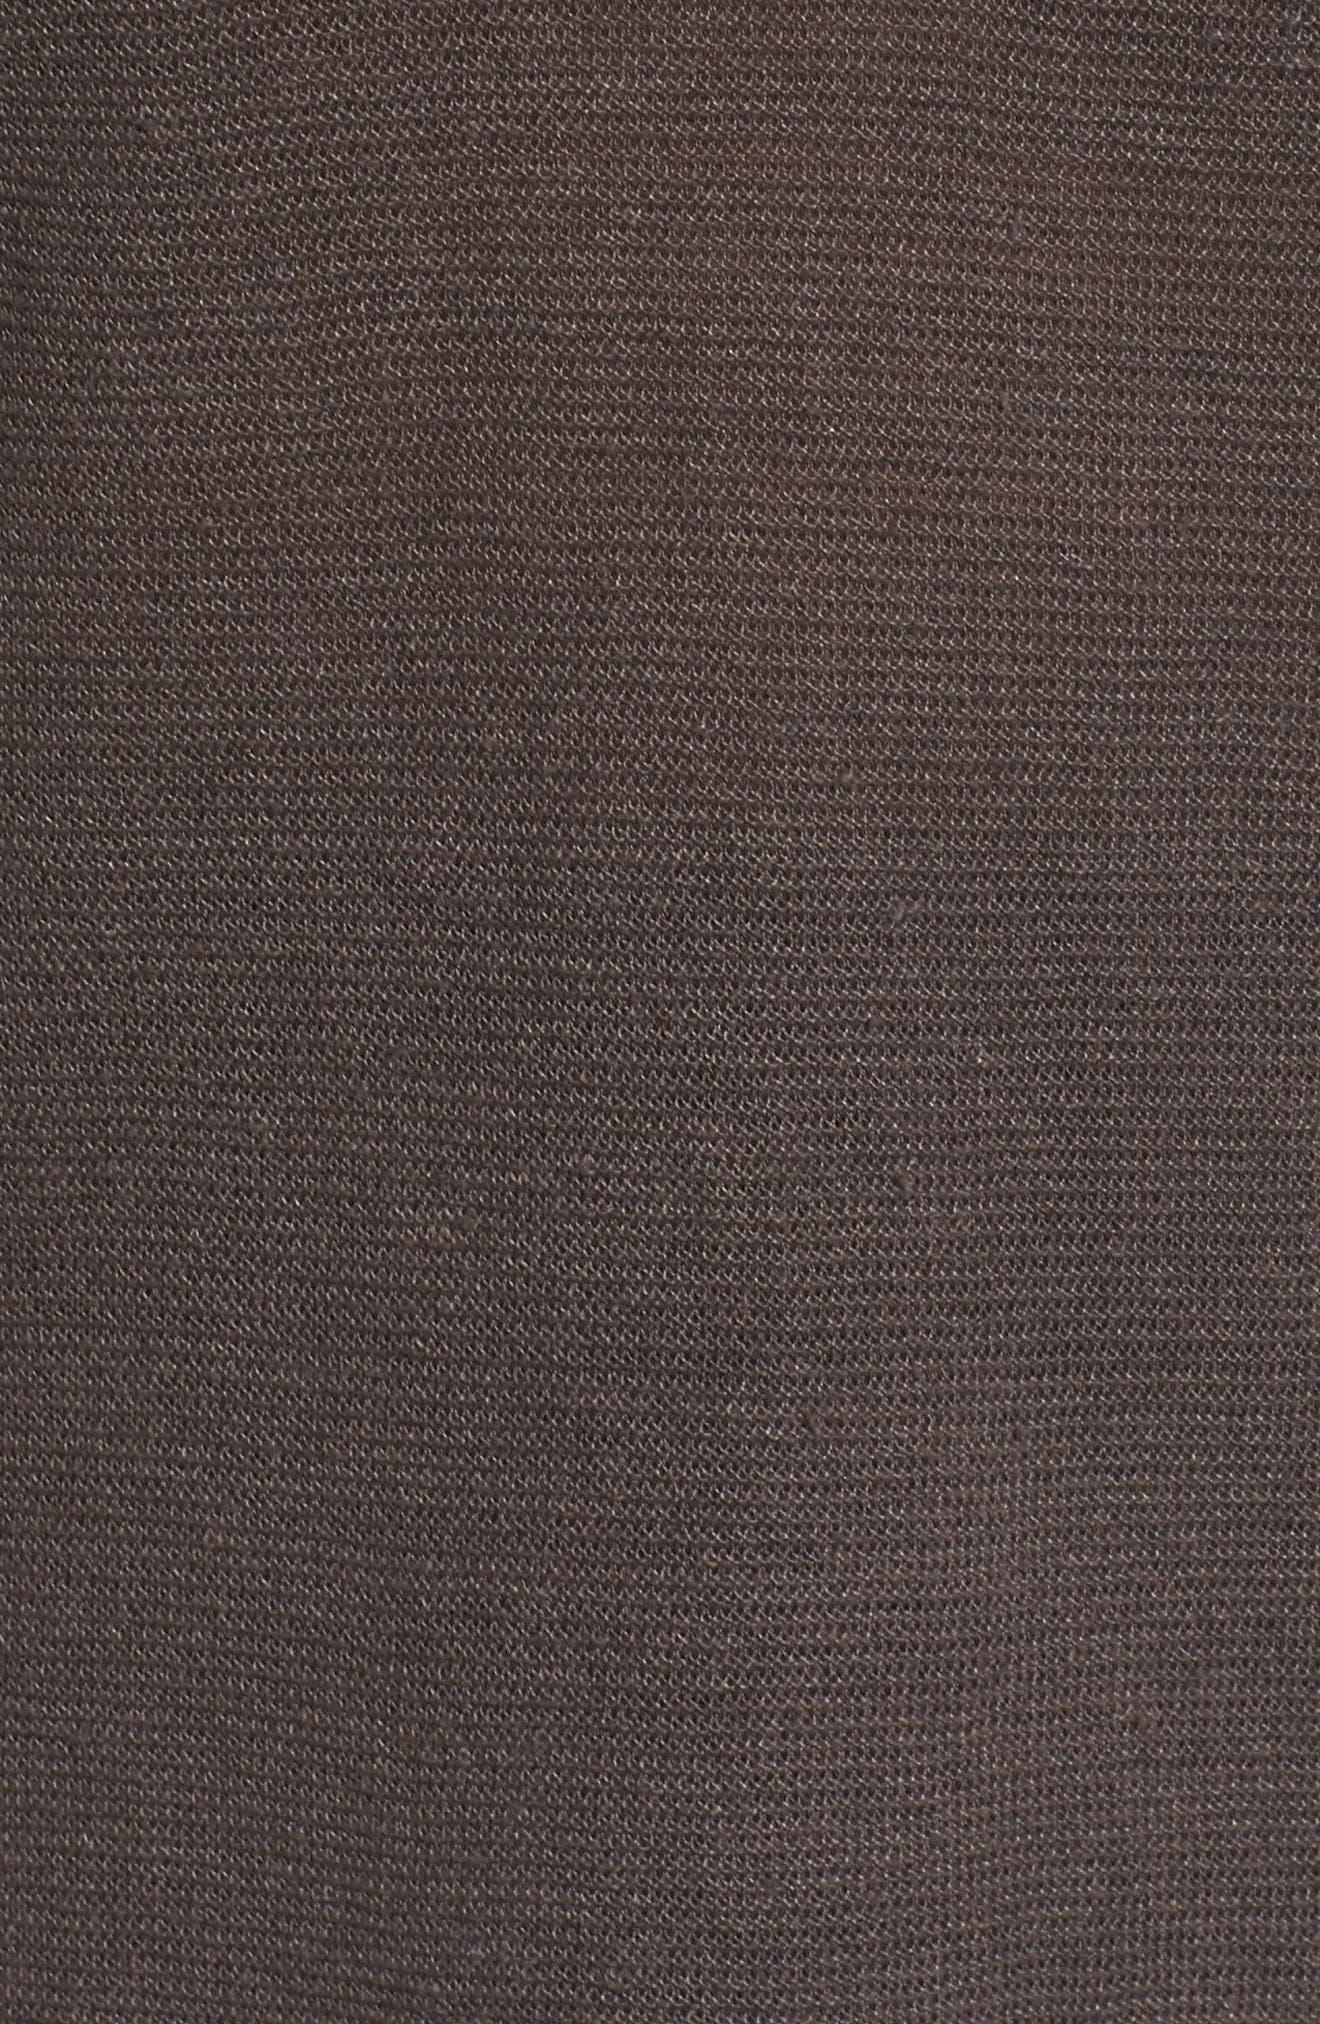 V-Neck Organic Linen Top,                             Alternate thumbnail 27, color,